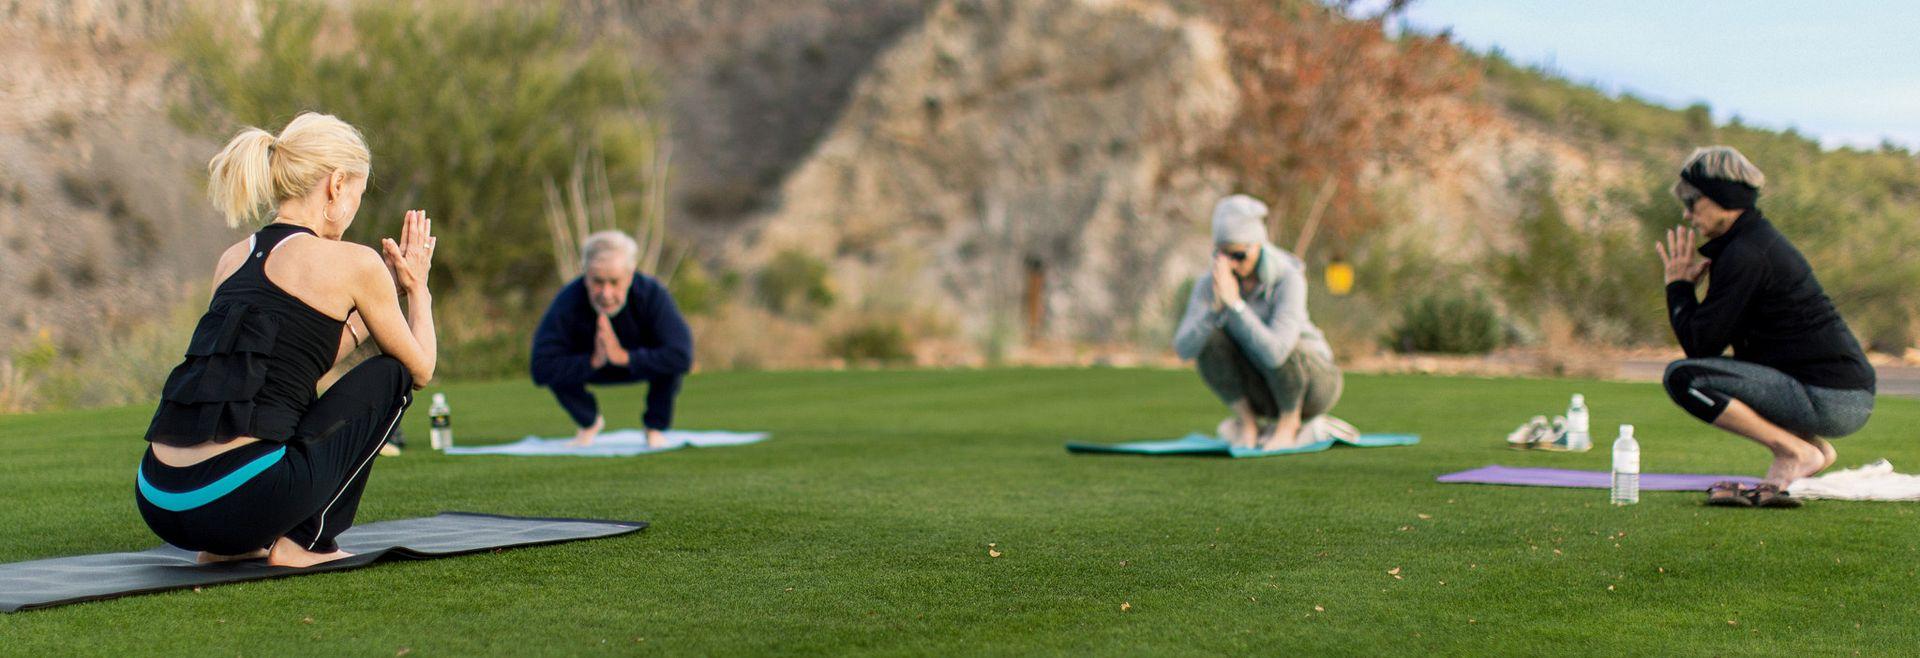 Trilogy Homeowners at Yoga